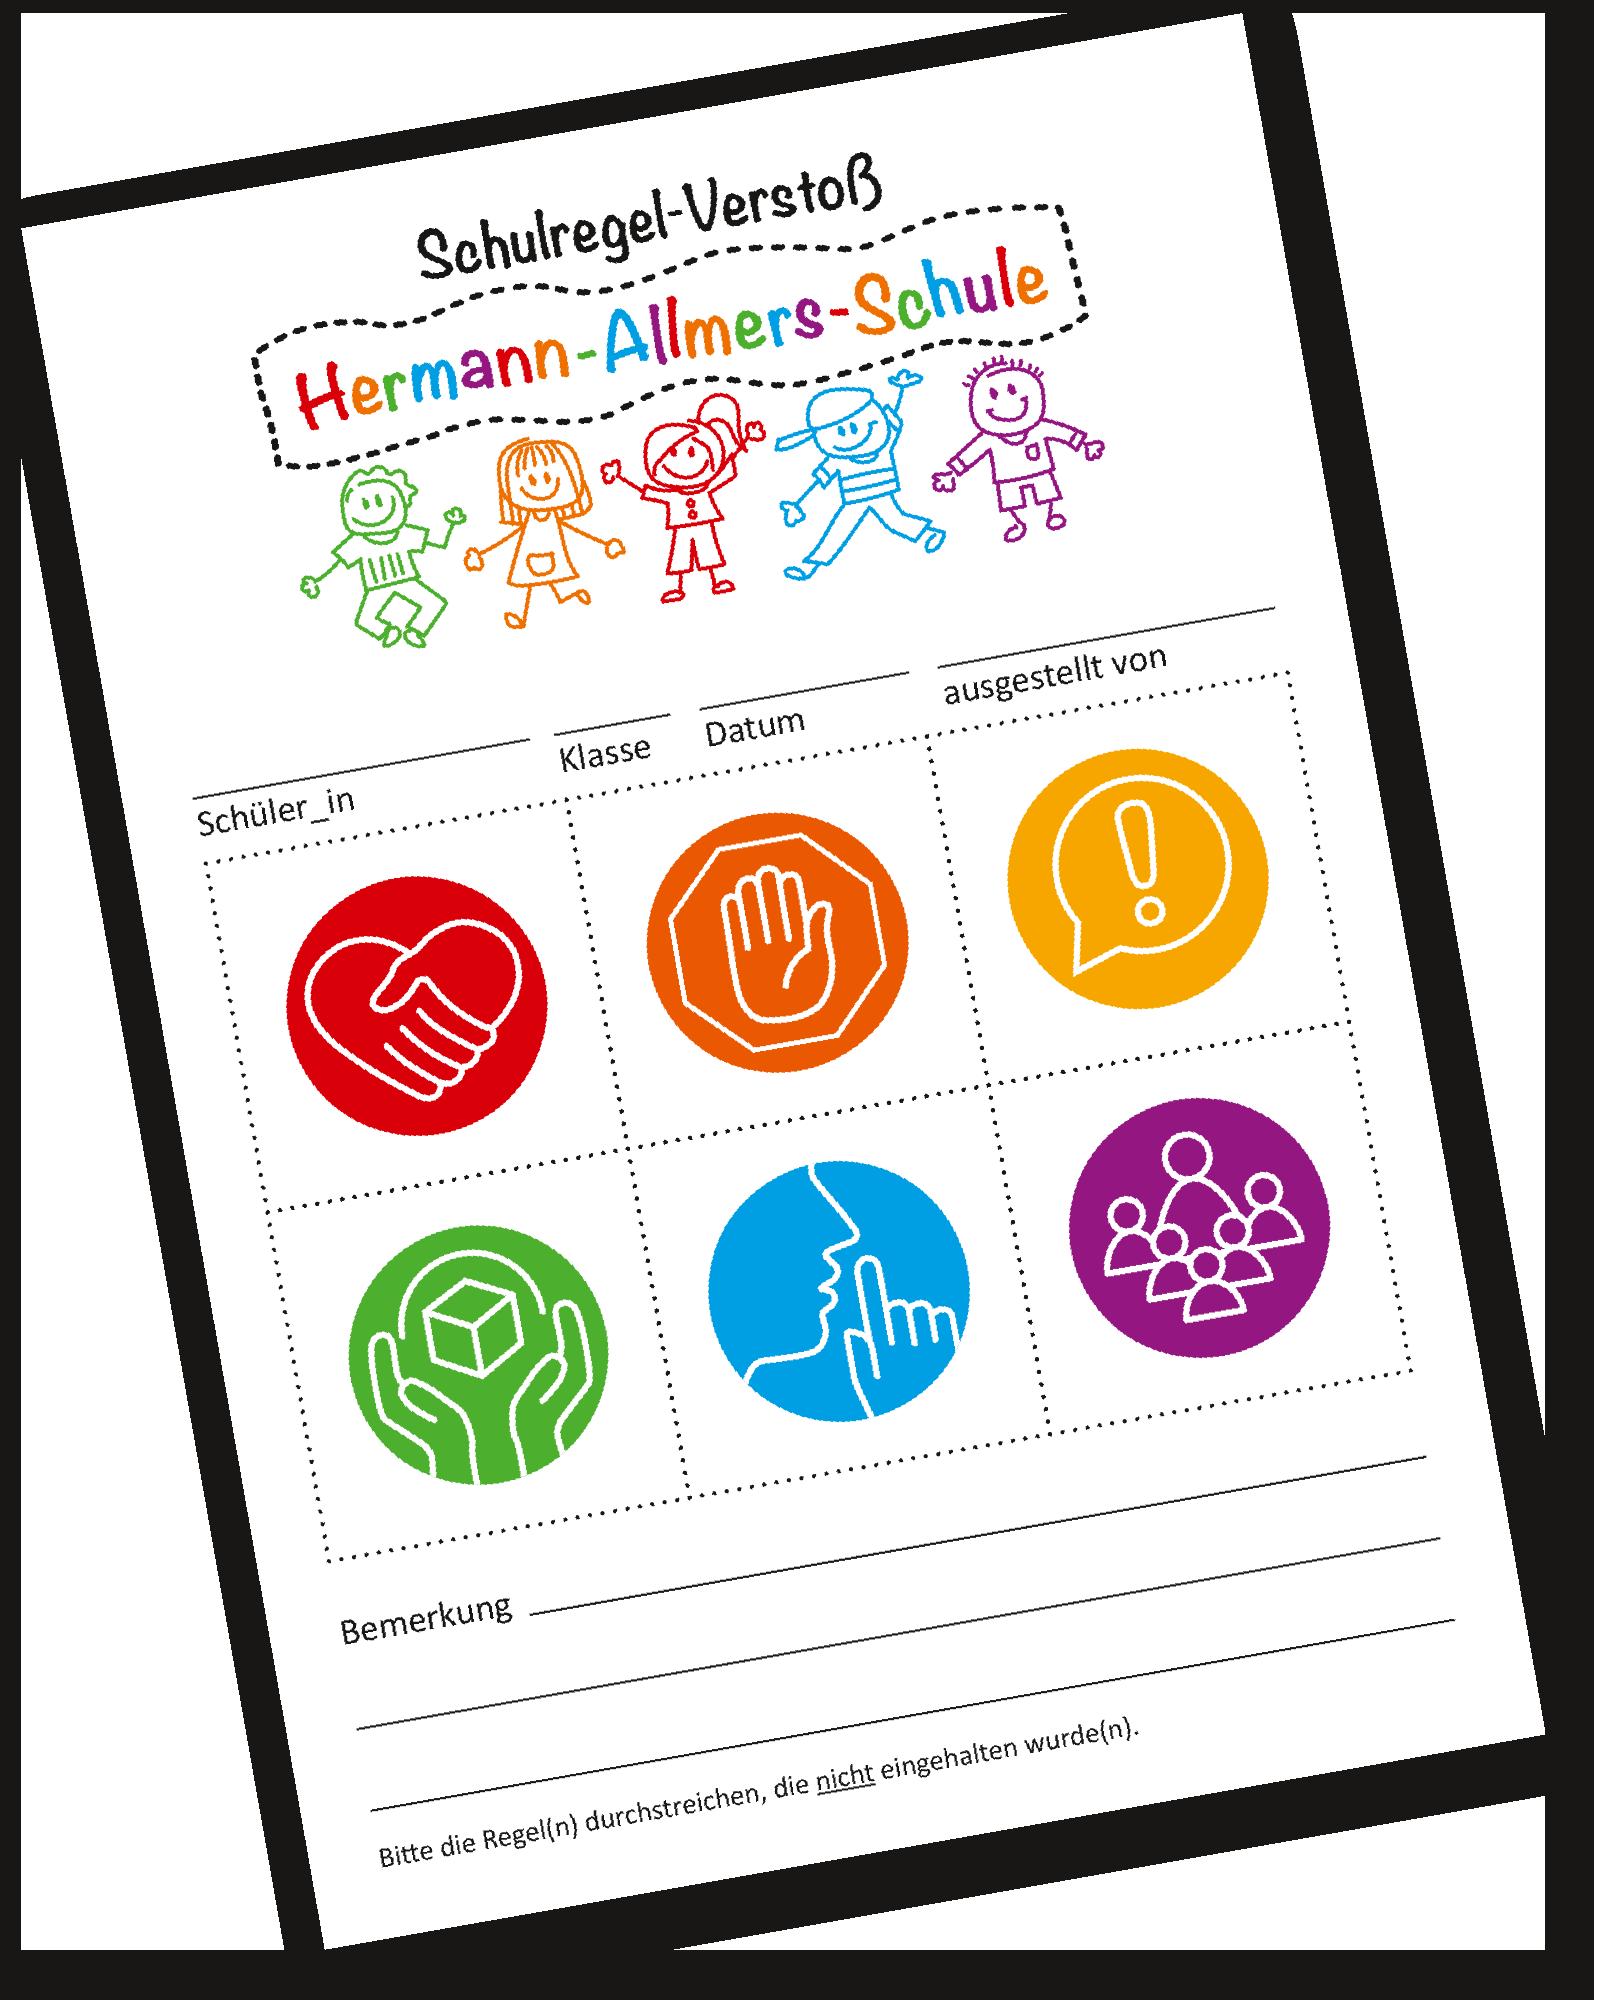 Schulregeln_Ticket_HermannAllmersSchule